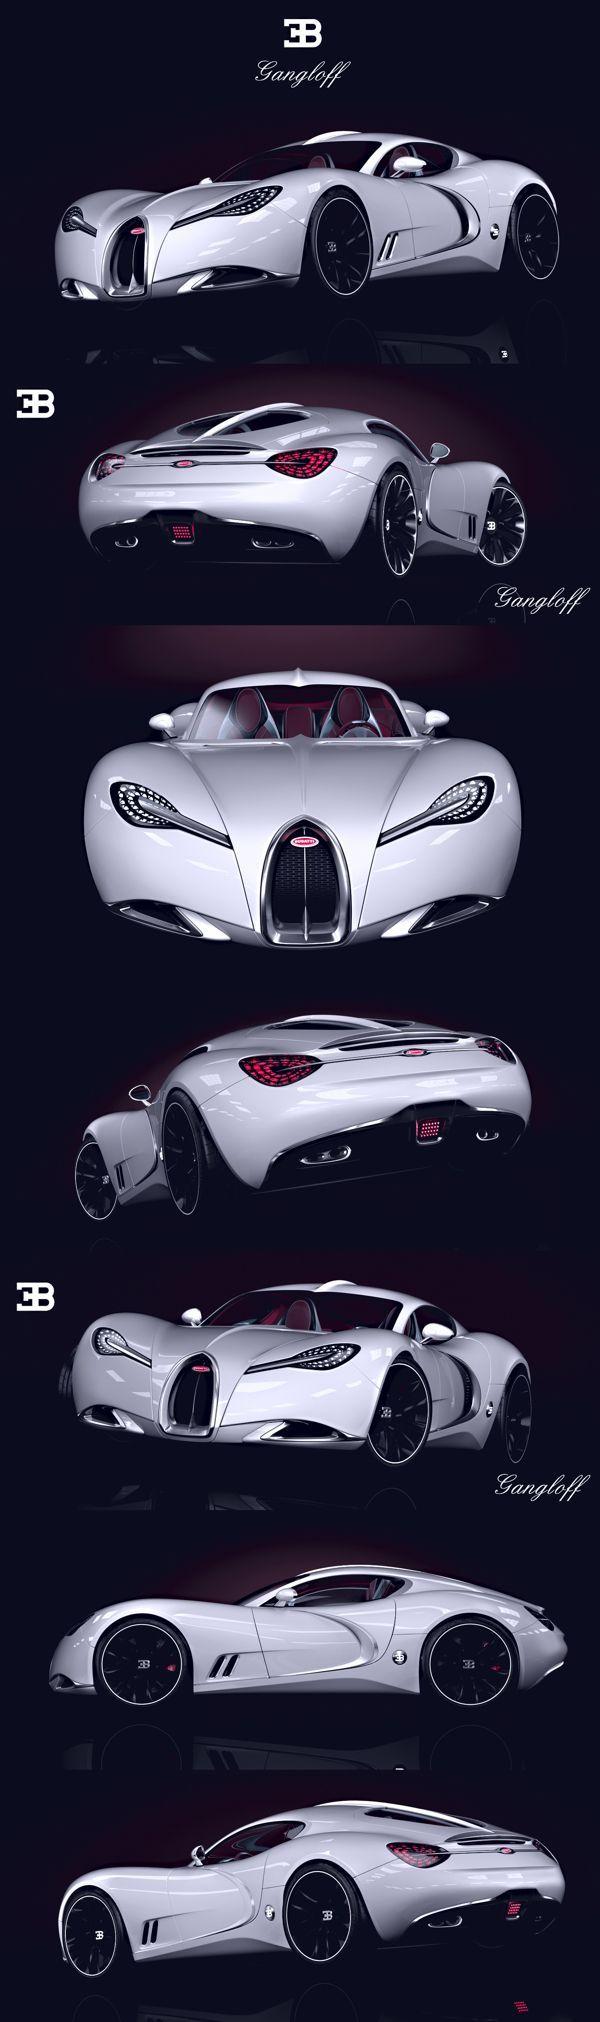 Bugatti Gangloff Concept  -100% badass!